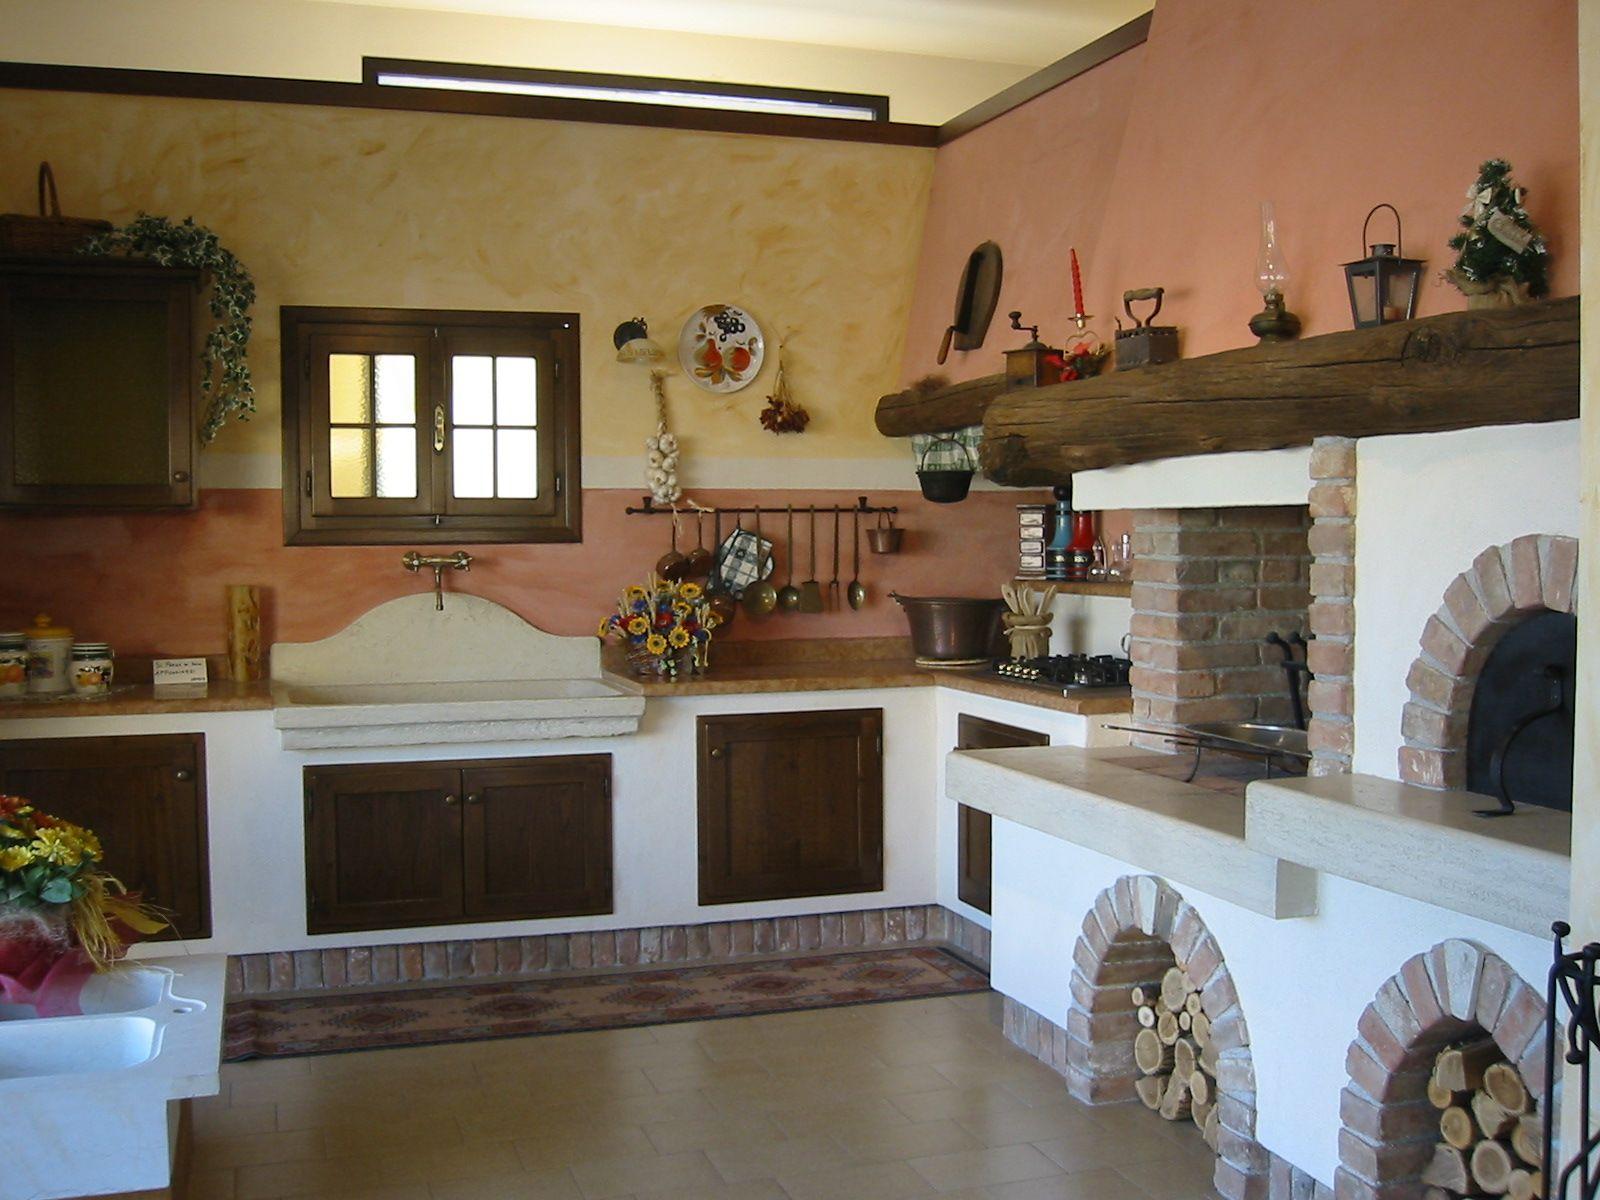 Cucina Rustica Moderna | Cucine Stile Moderno Archivi Fazion Moreno ...